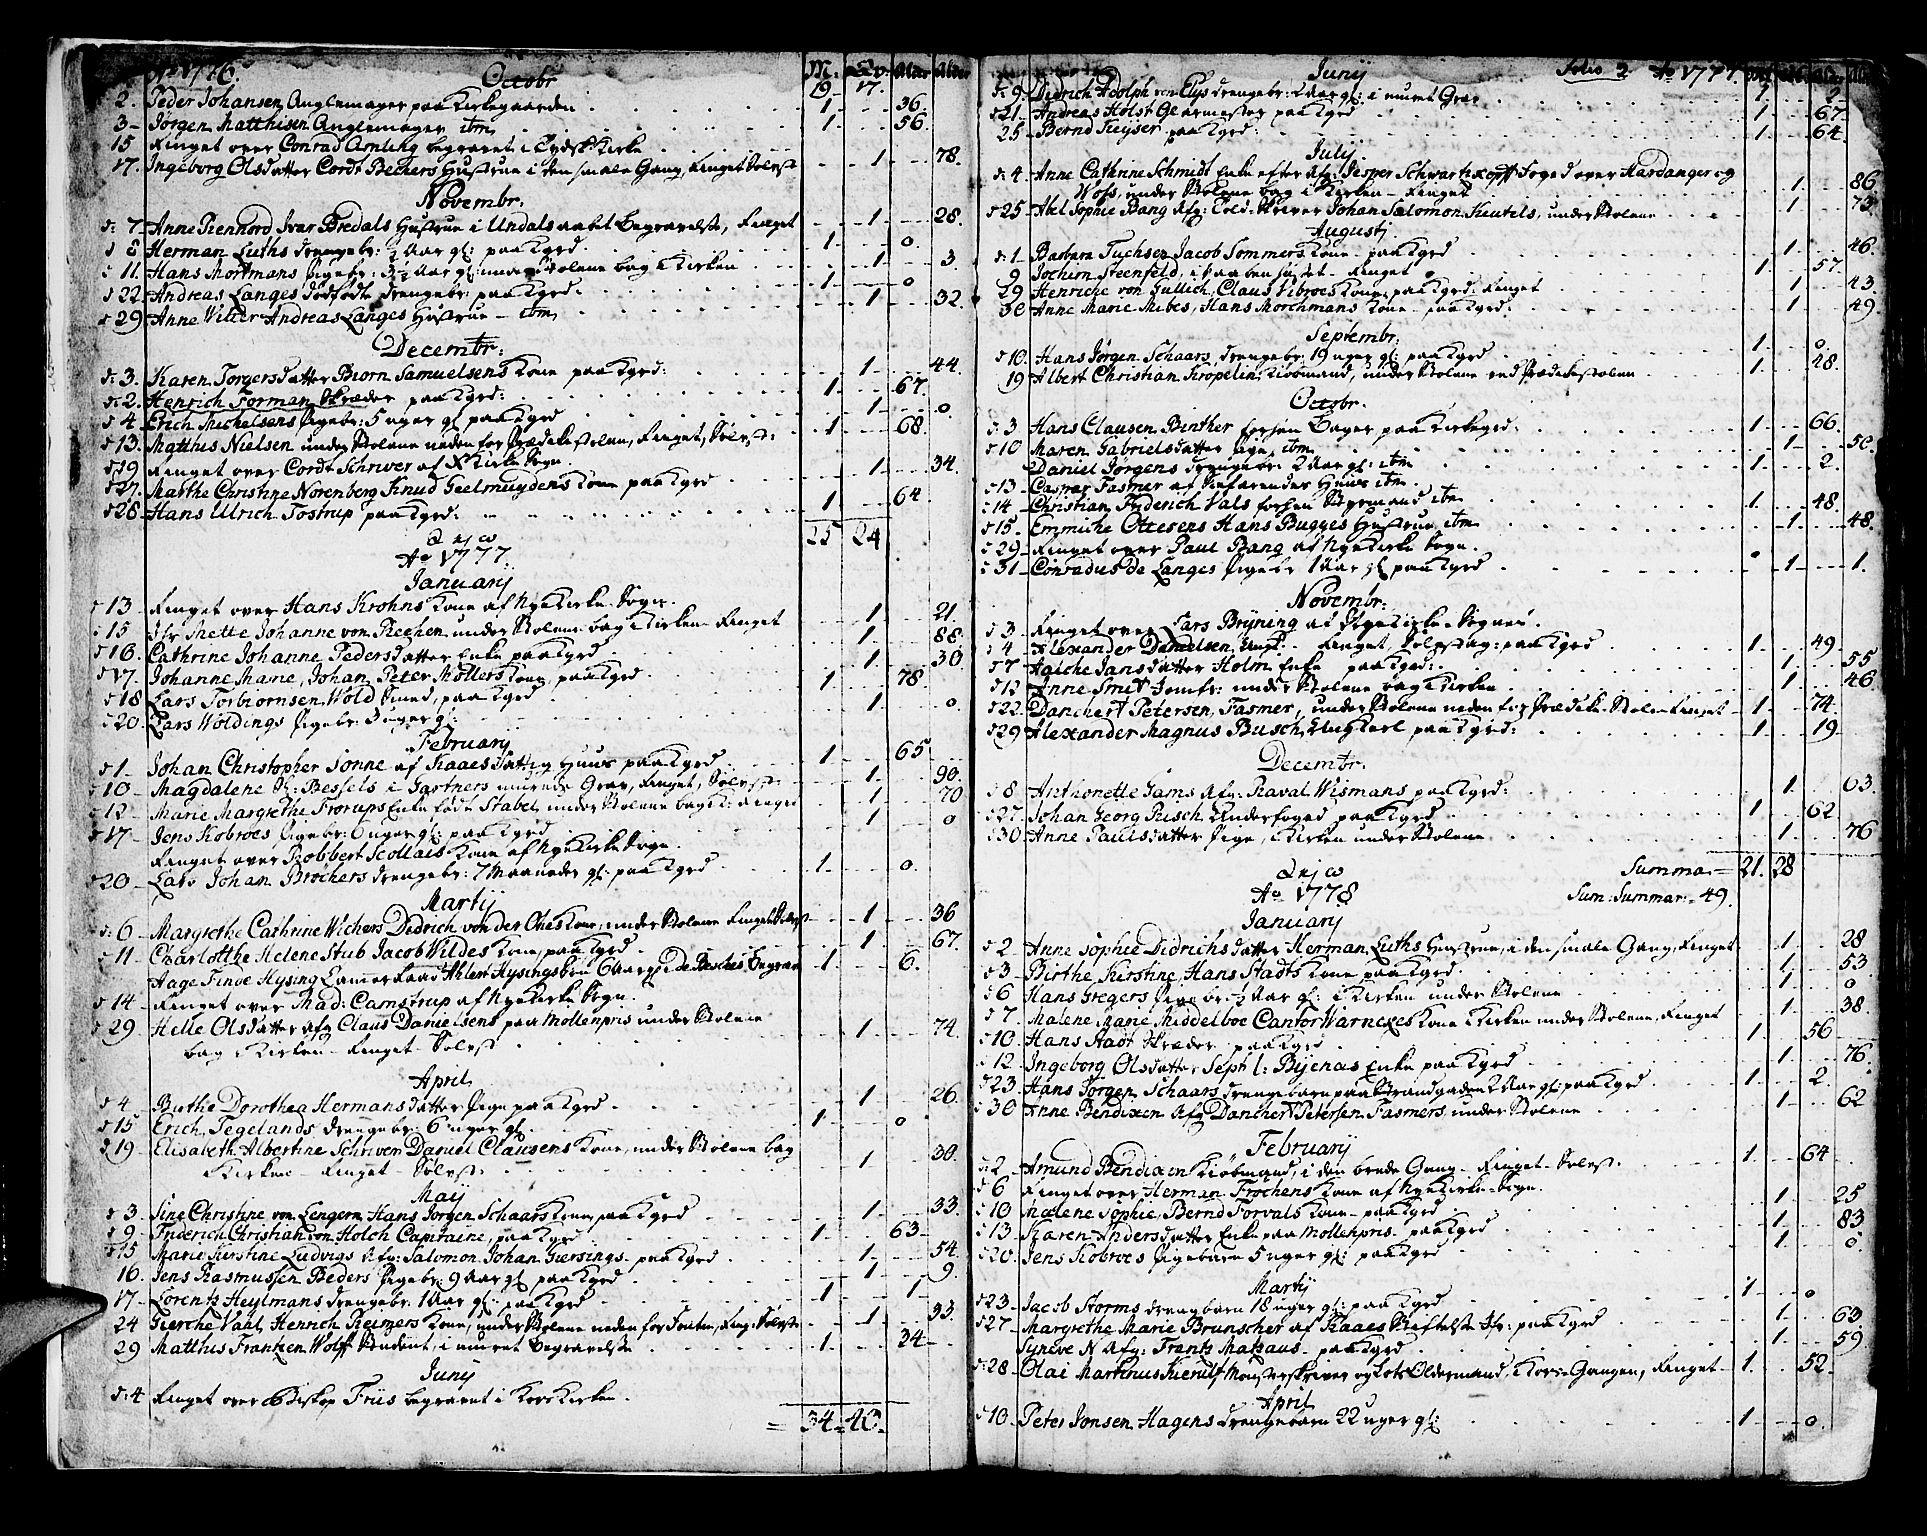 SAB, Domkirken sokneprestembete, H/Haa/L0009: Ministerialbok nr. A 9, 1776-1821, s. 2